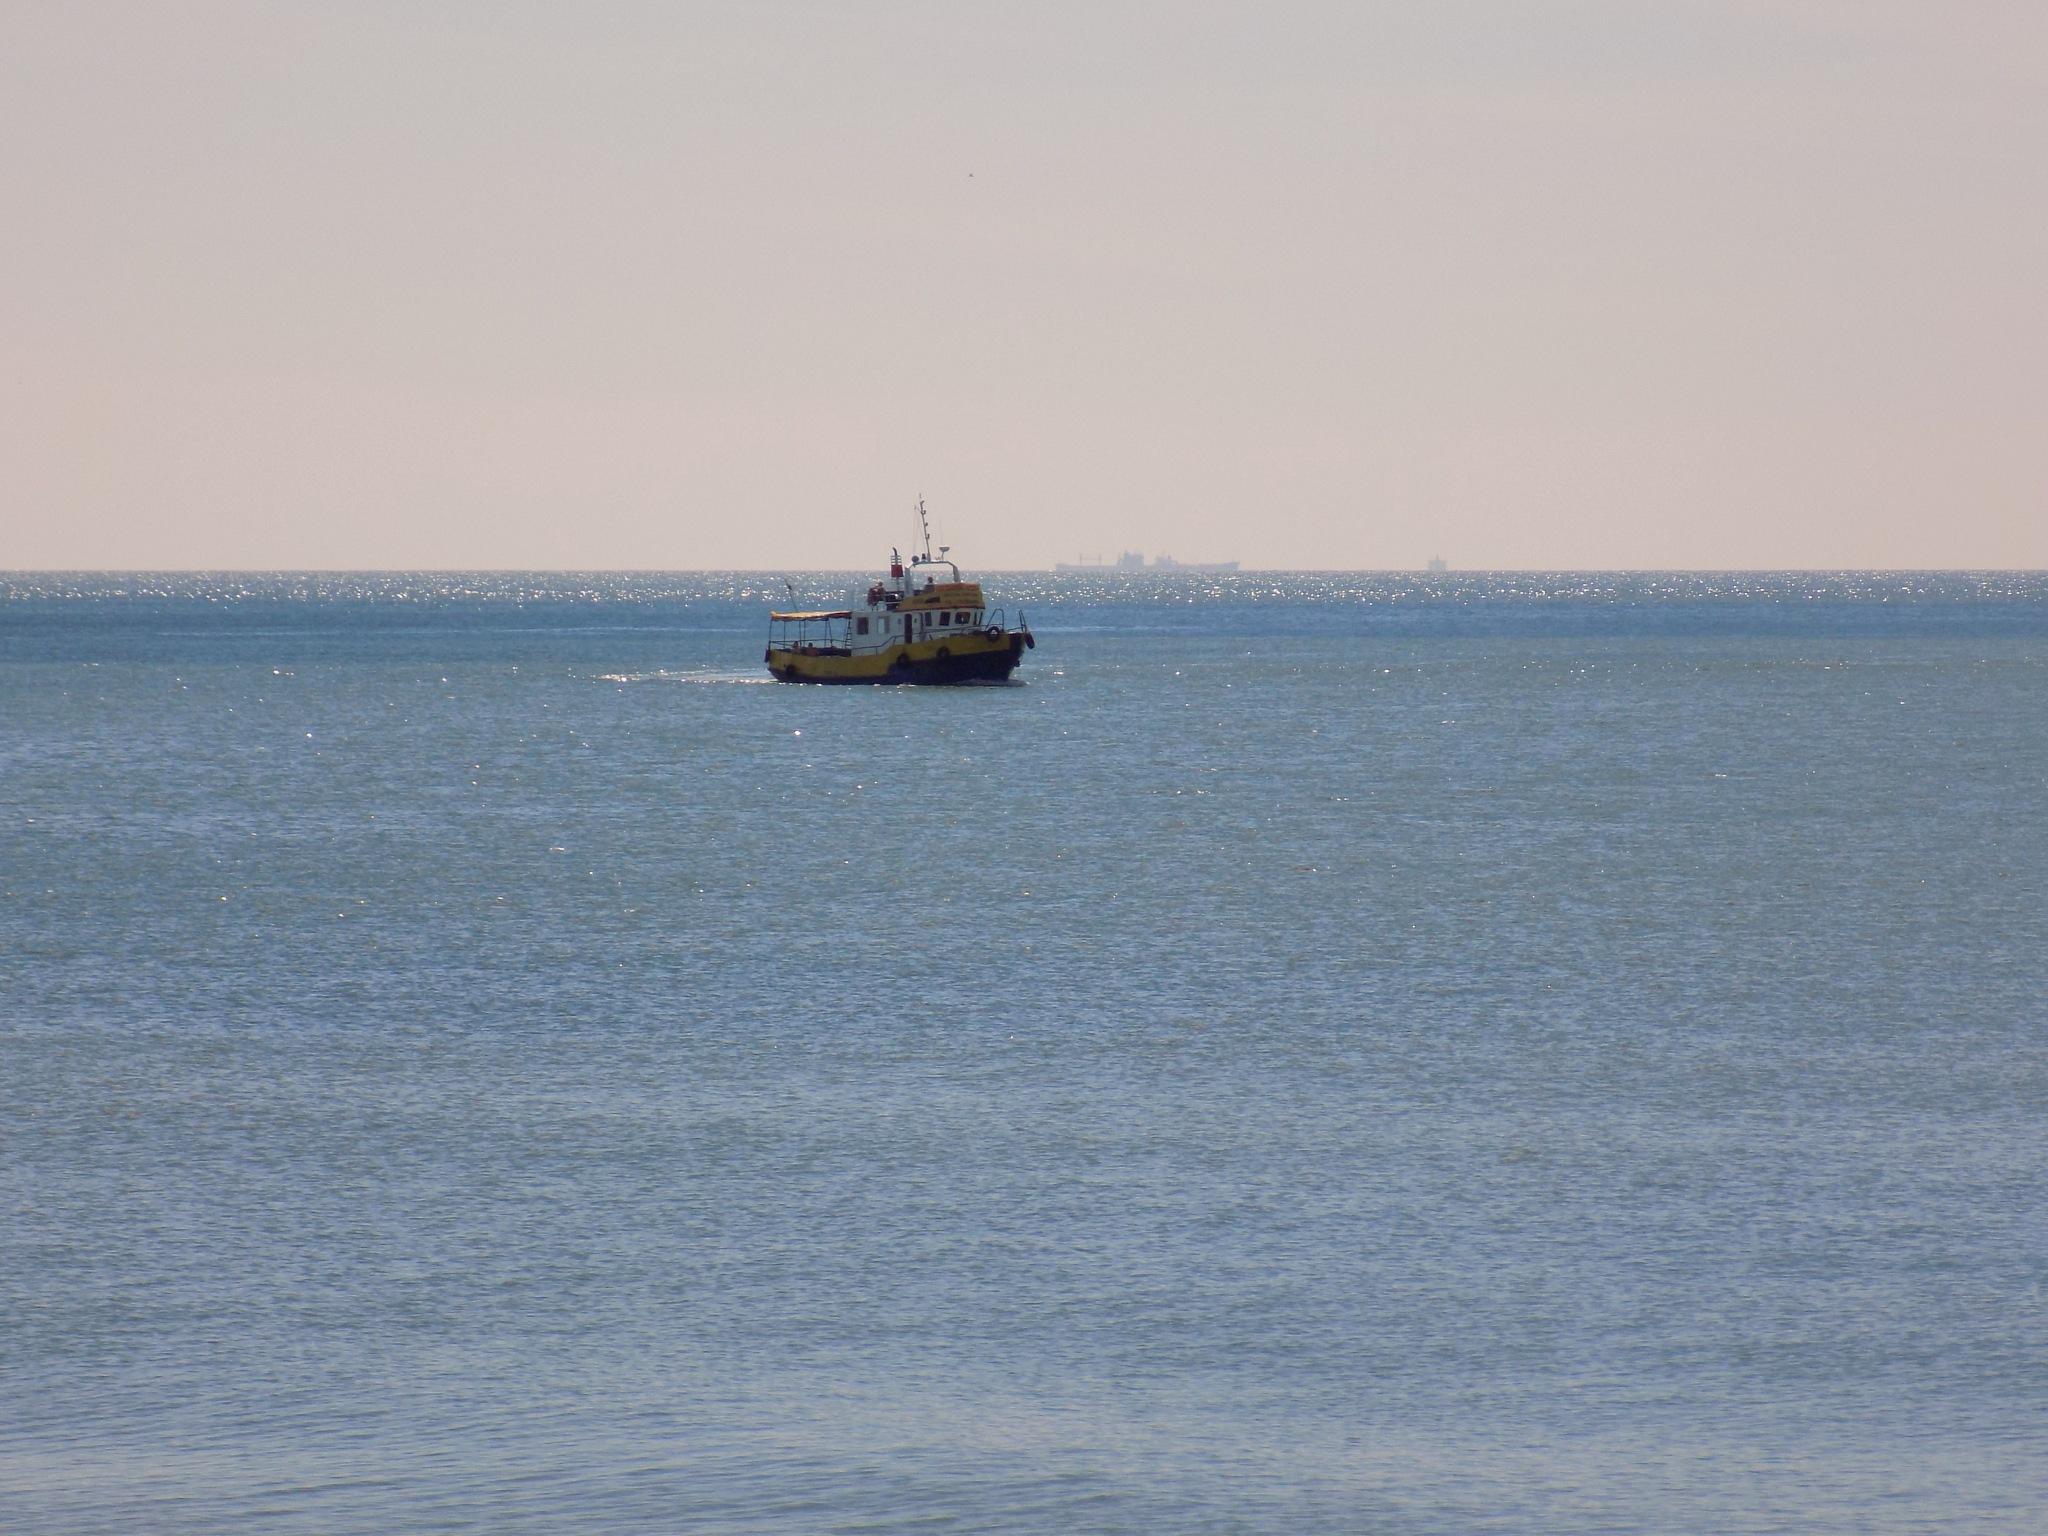 Boat at sea by uzkuraitiene62